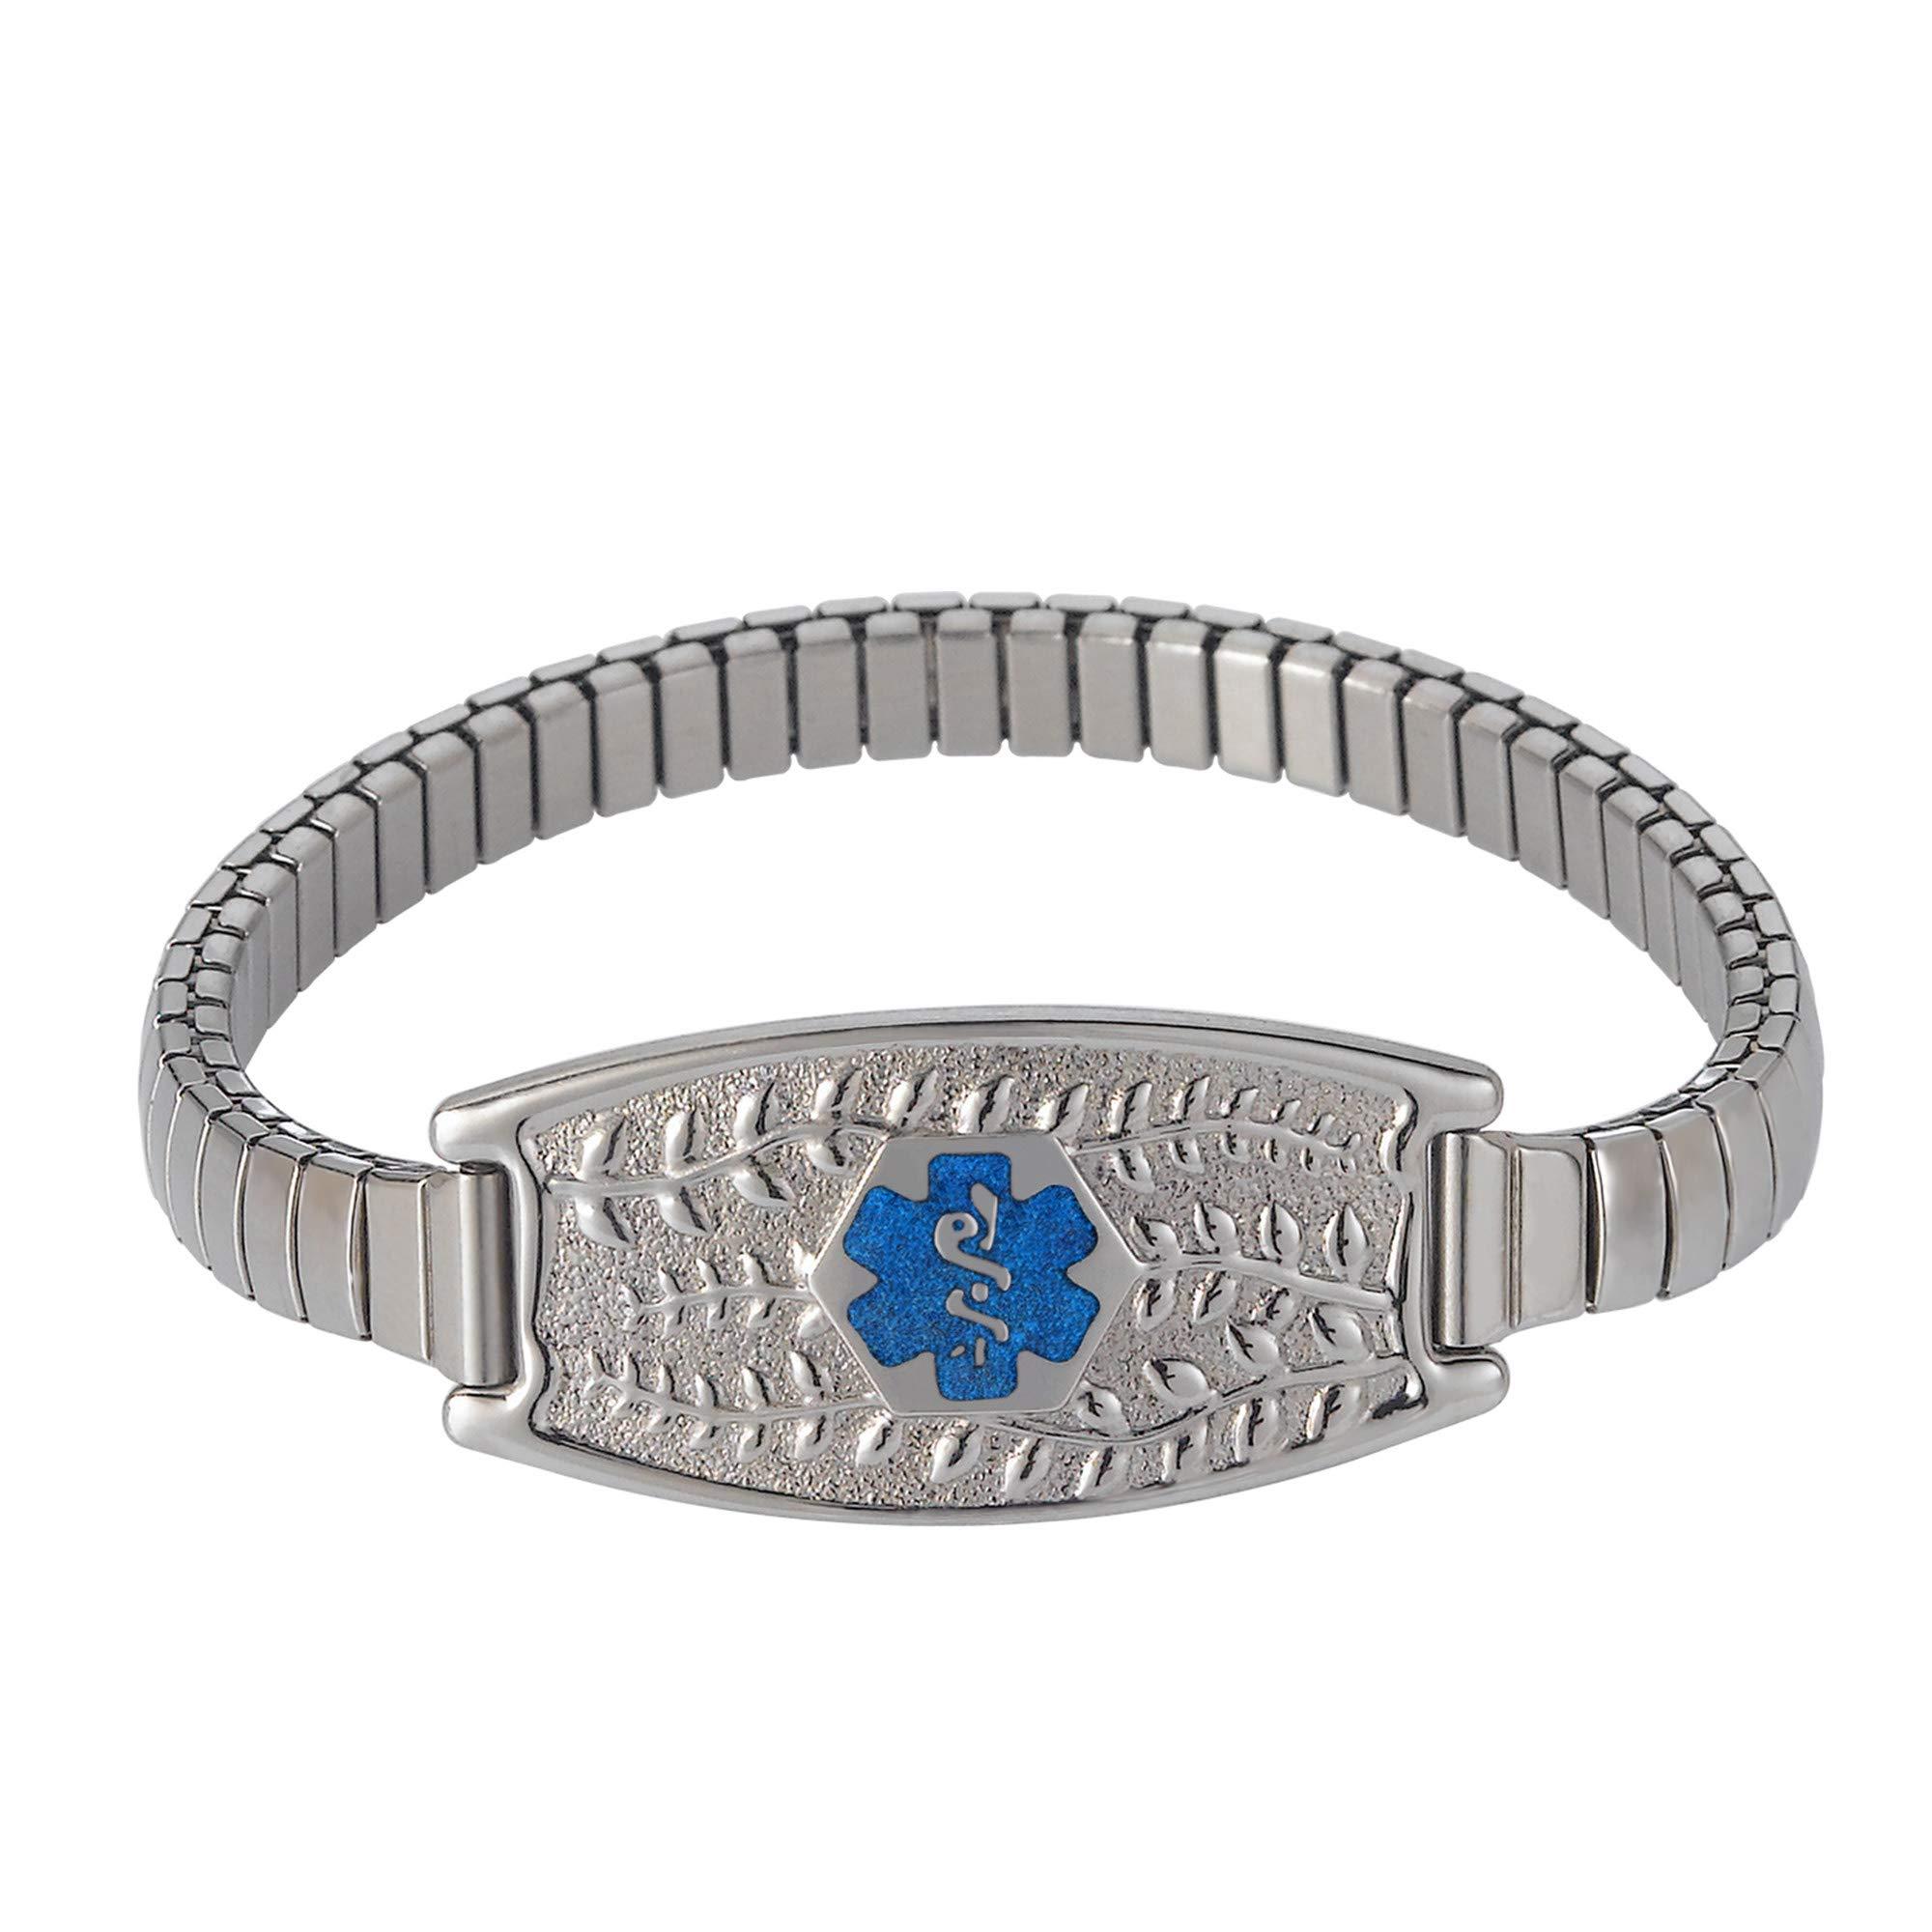 Divoti Deep Custom Laser Engraved Beautiful Olive Stretch Medical Alert Bracelet w/Free Engraving - 7.5'' Band for 6.5-7.5'' Wrists-TP Blue